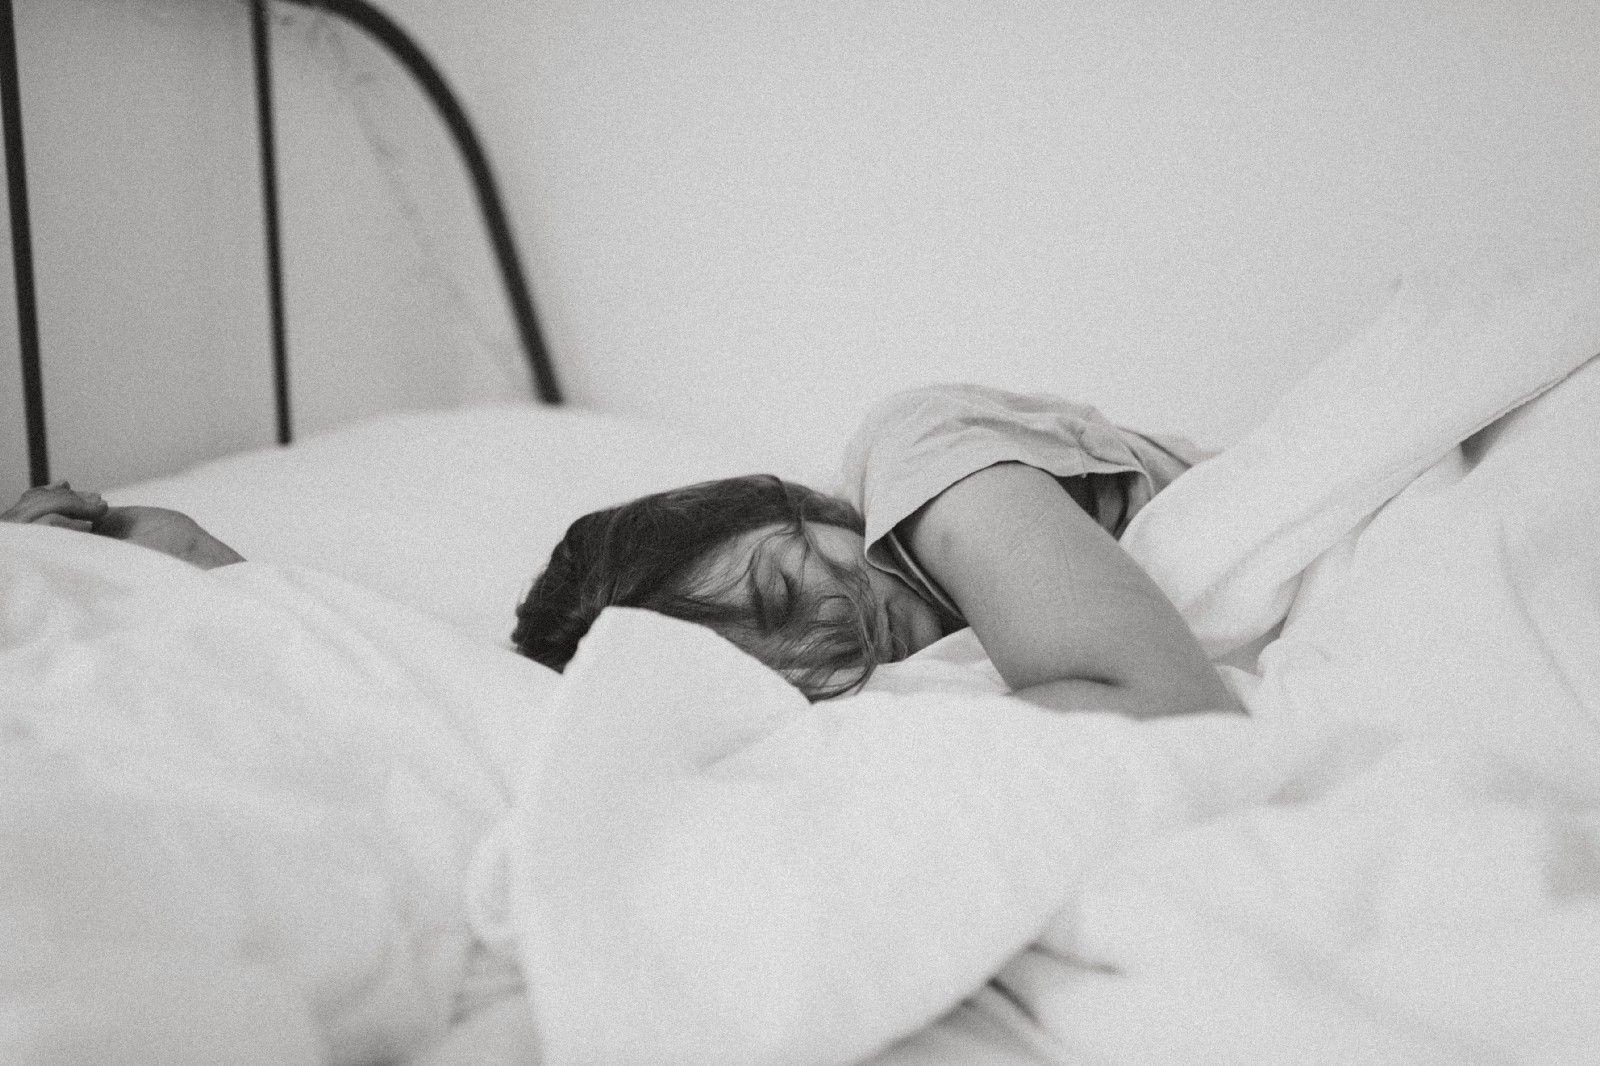 Geras miegas